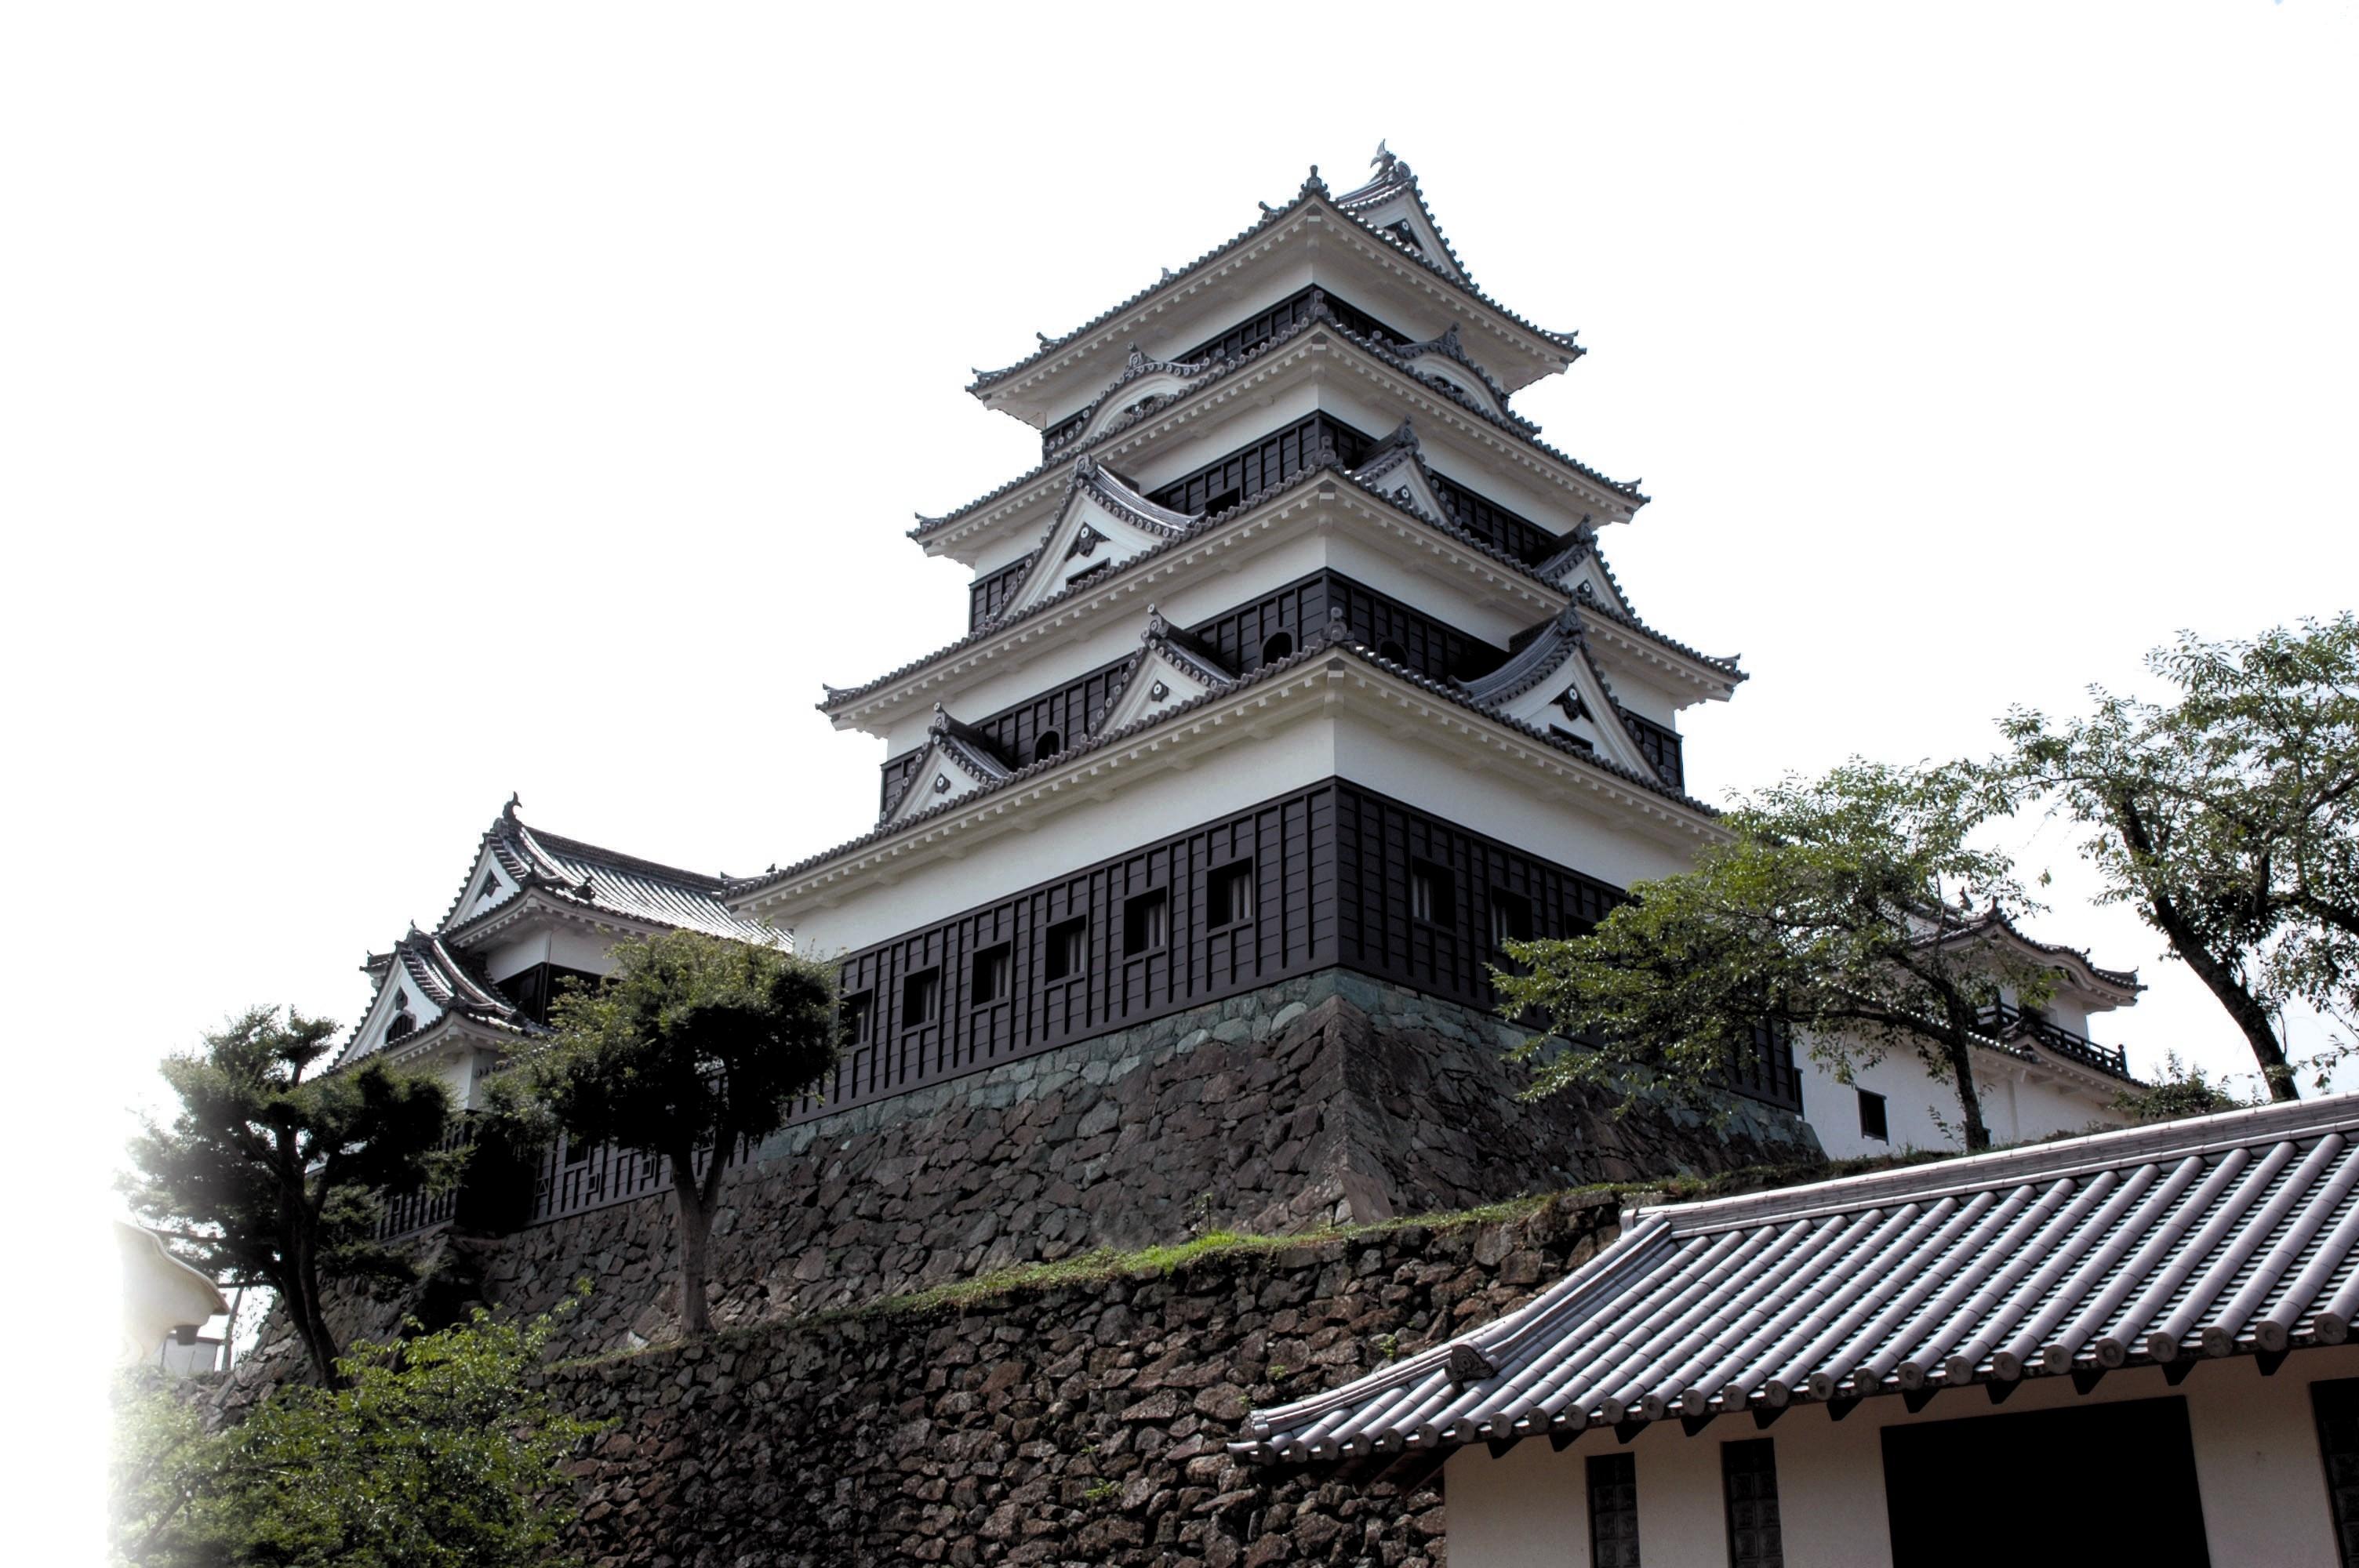 愛媛県のお城特集!宇和島城・松山城・大洲城・今治城・湯築城など